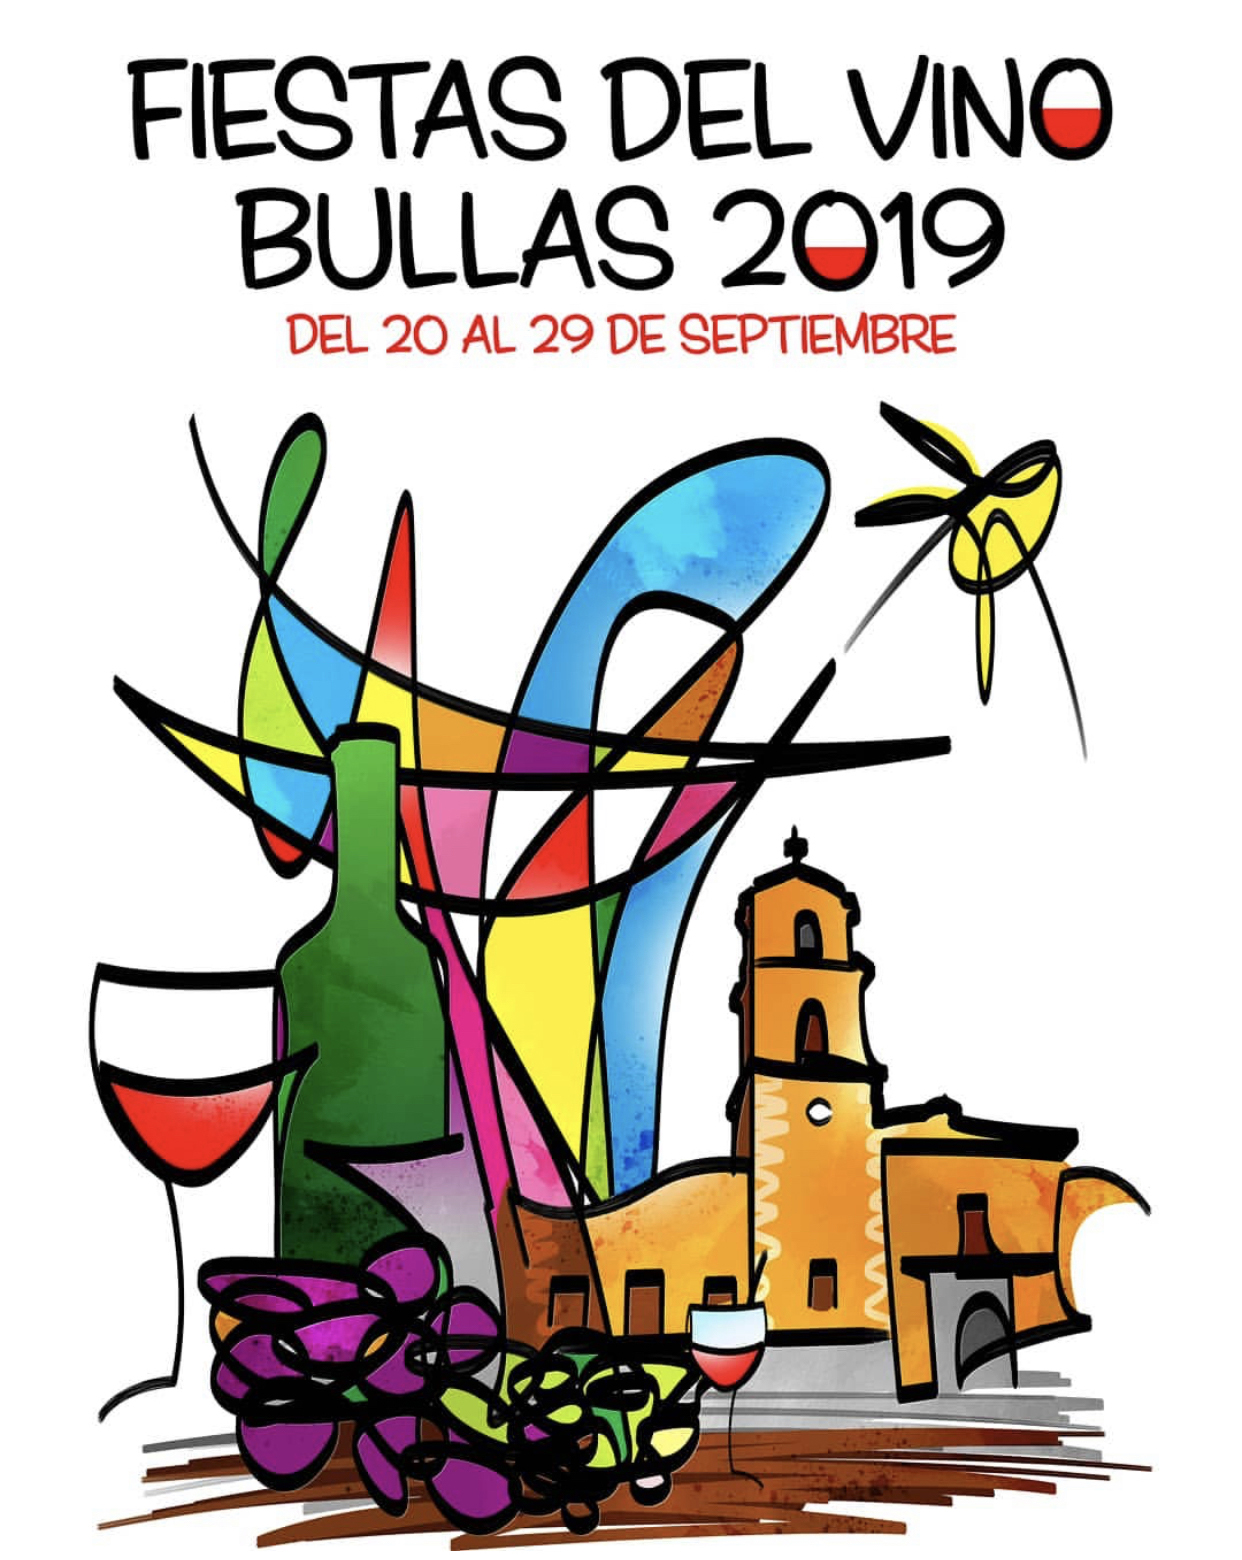 Fiestas del Vino de Bullas 2019.